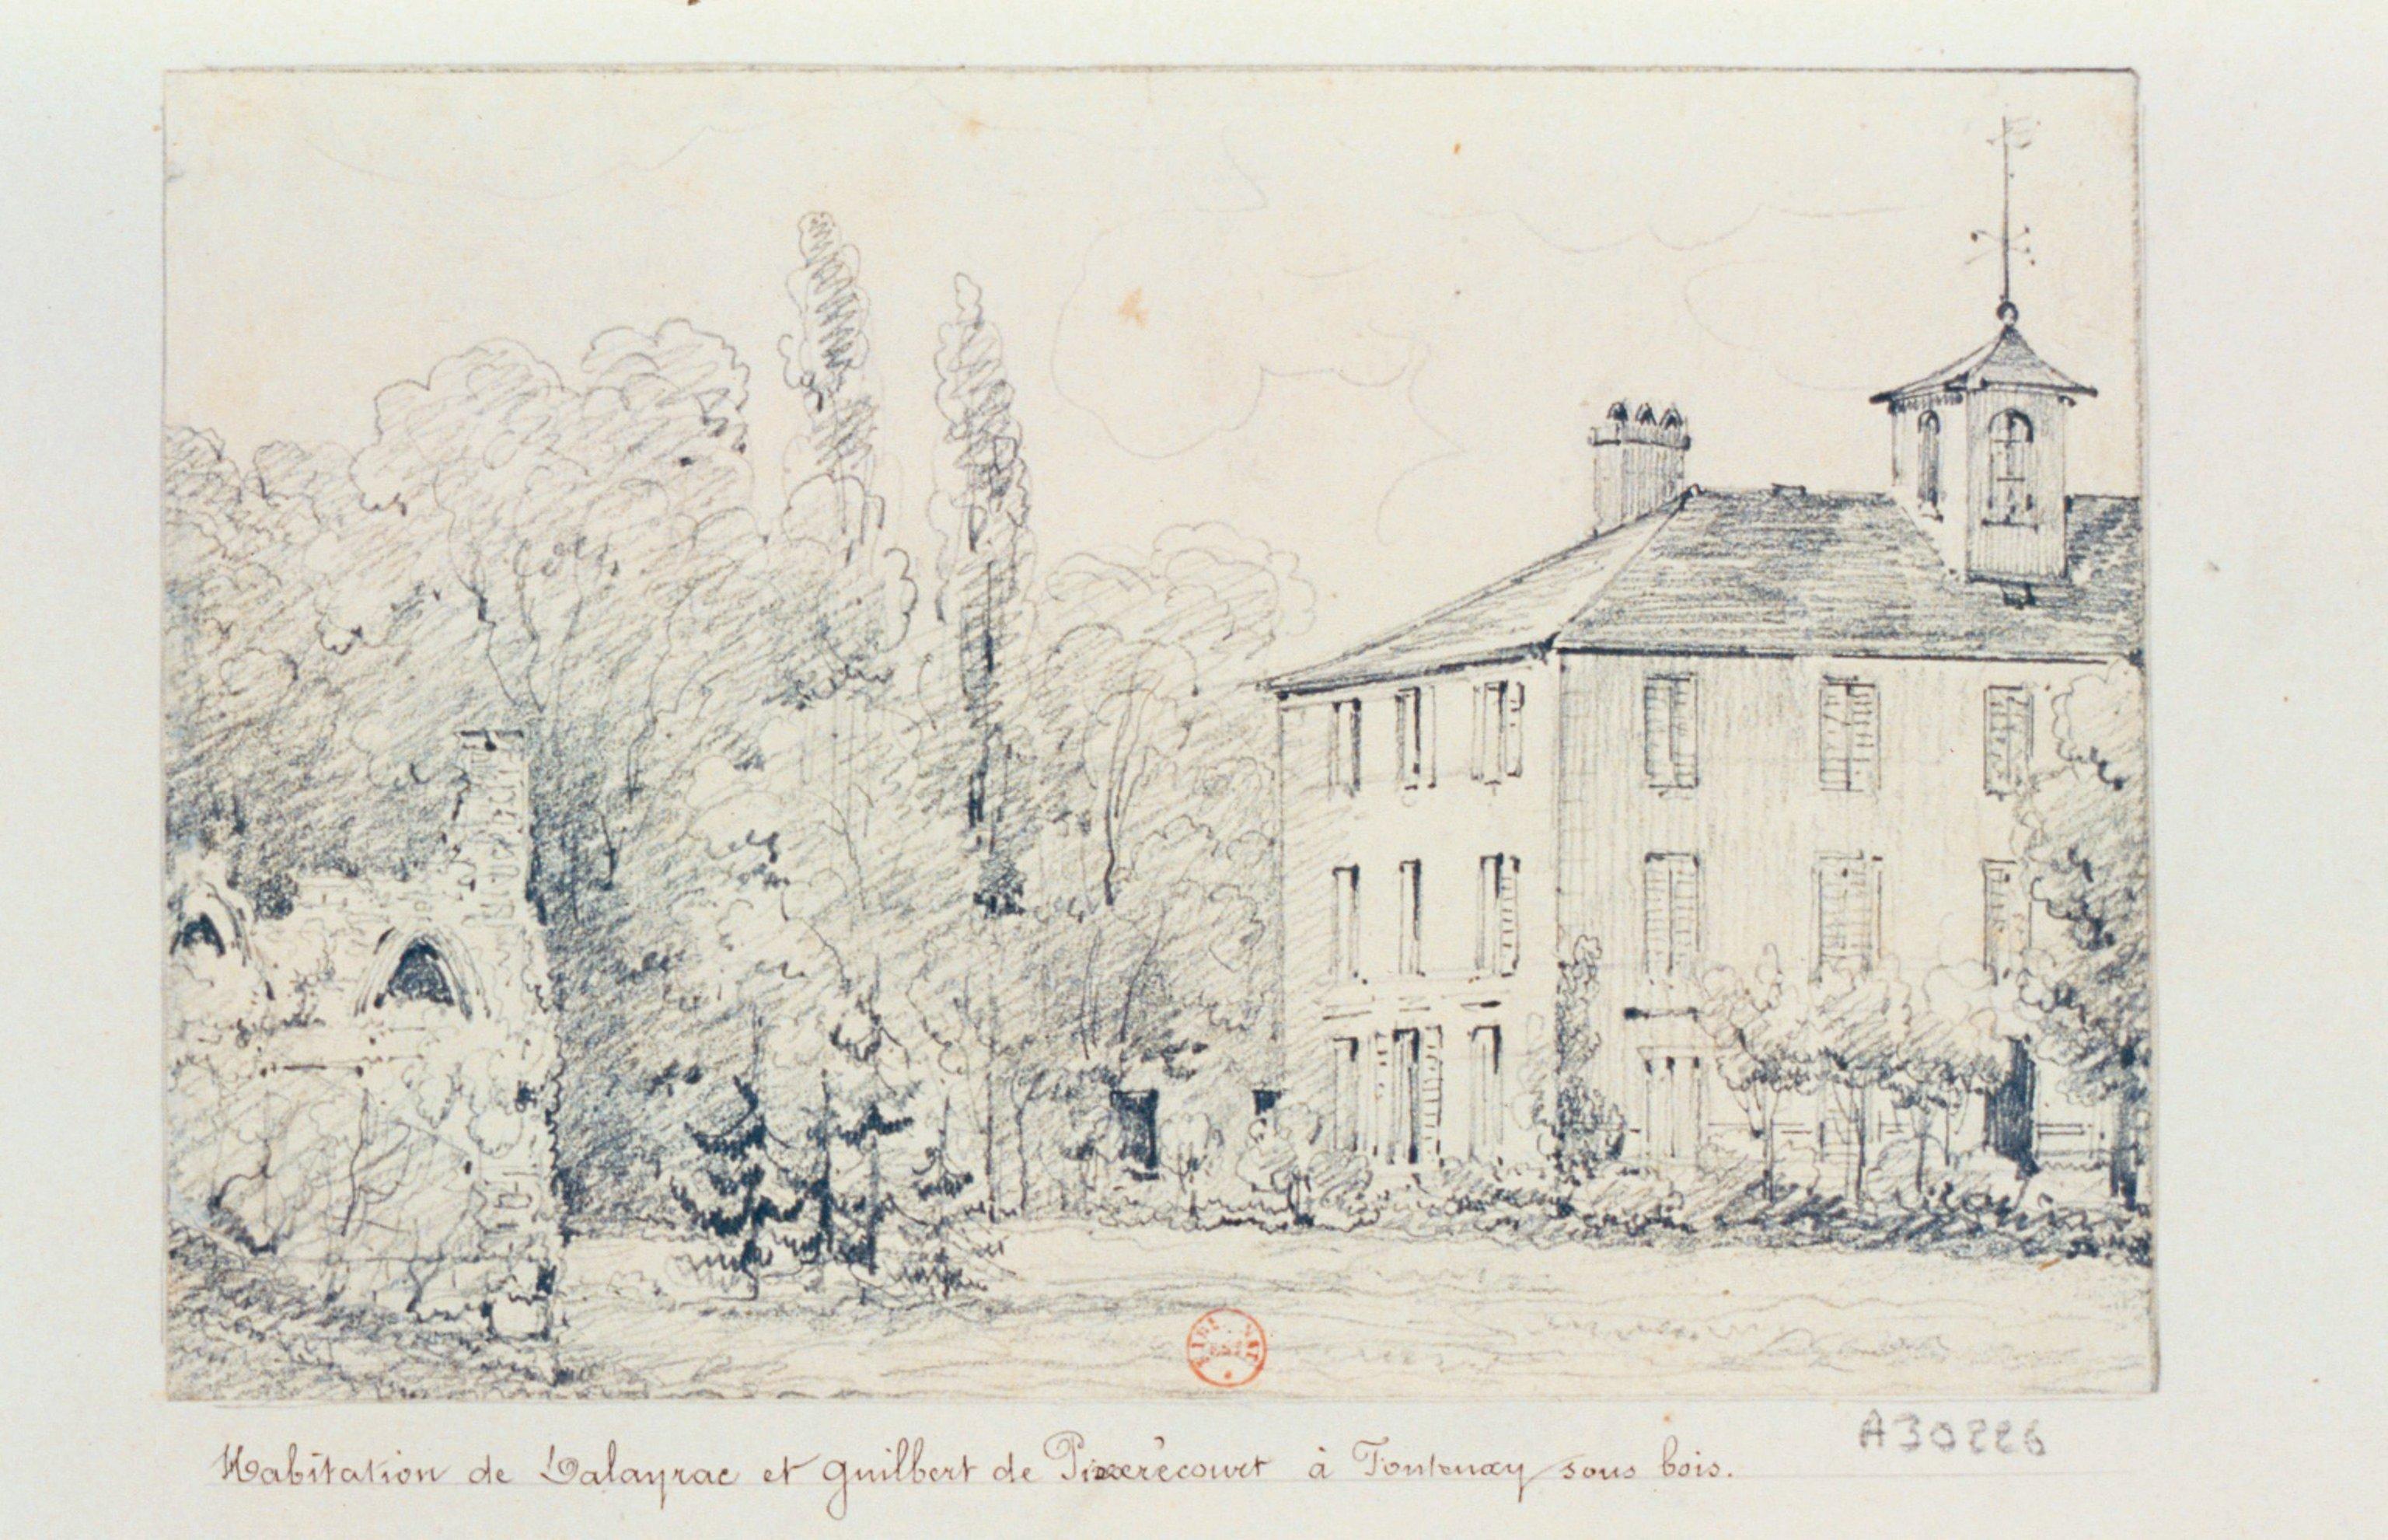 Bibliothèque De Fontenay Sous Bois file:fontenay sb maison dalayrac - wikimedia commons